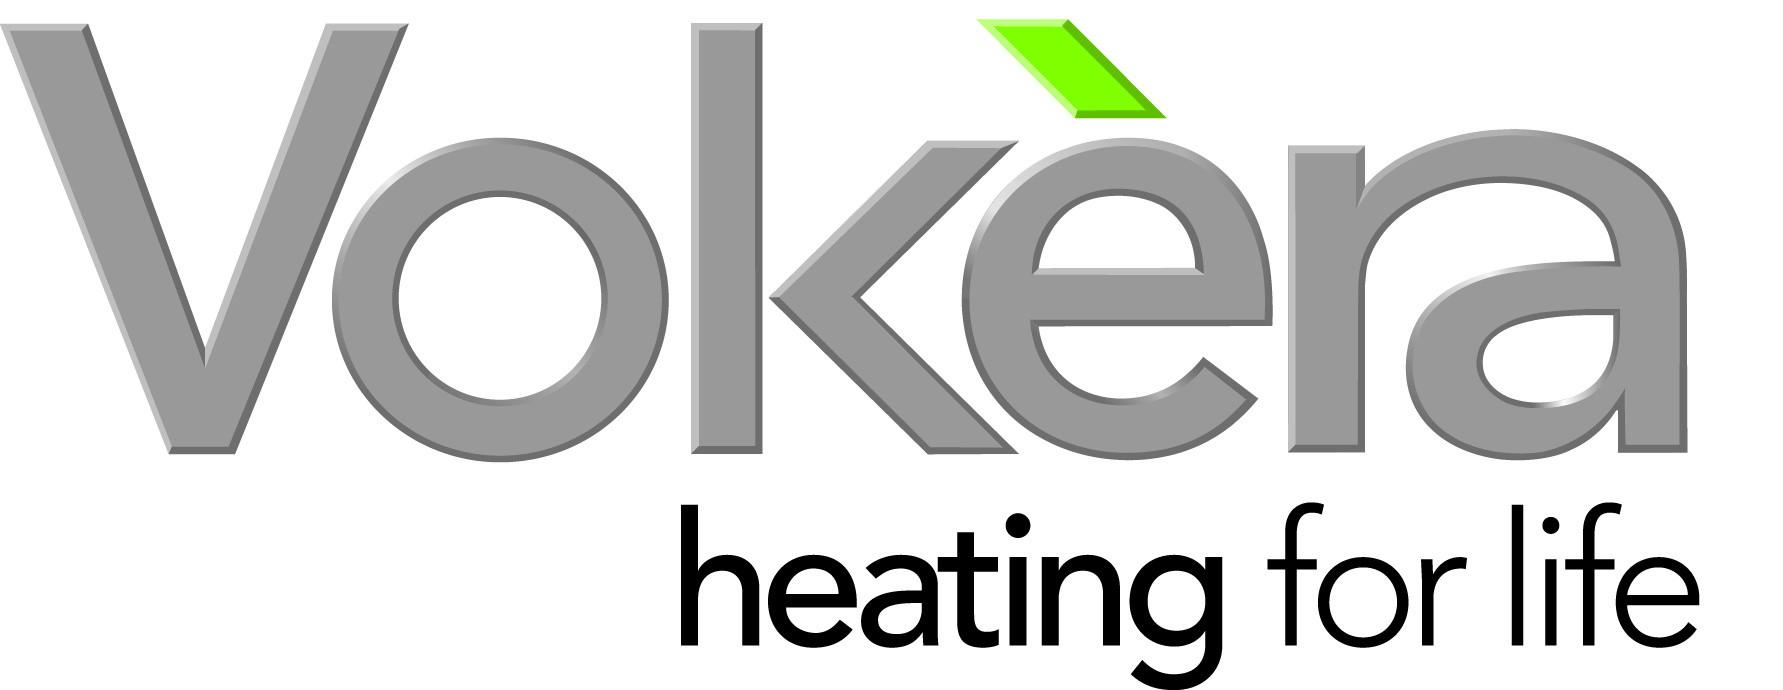 Vokera boiler service